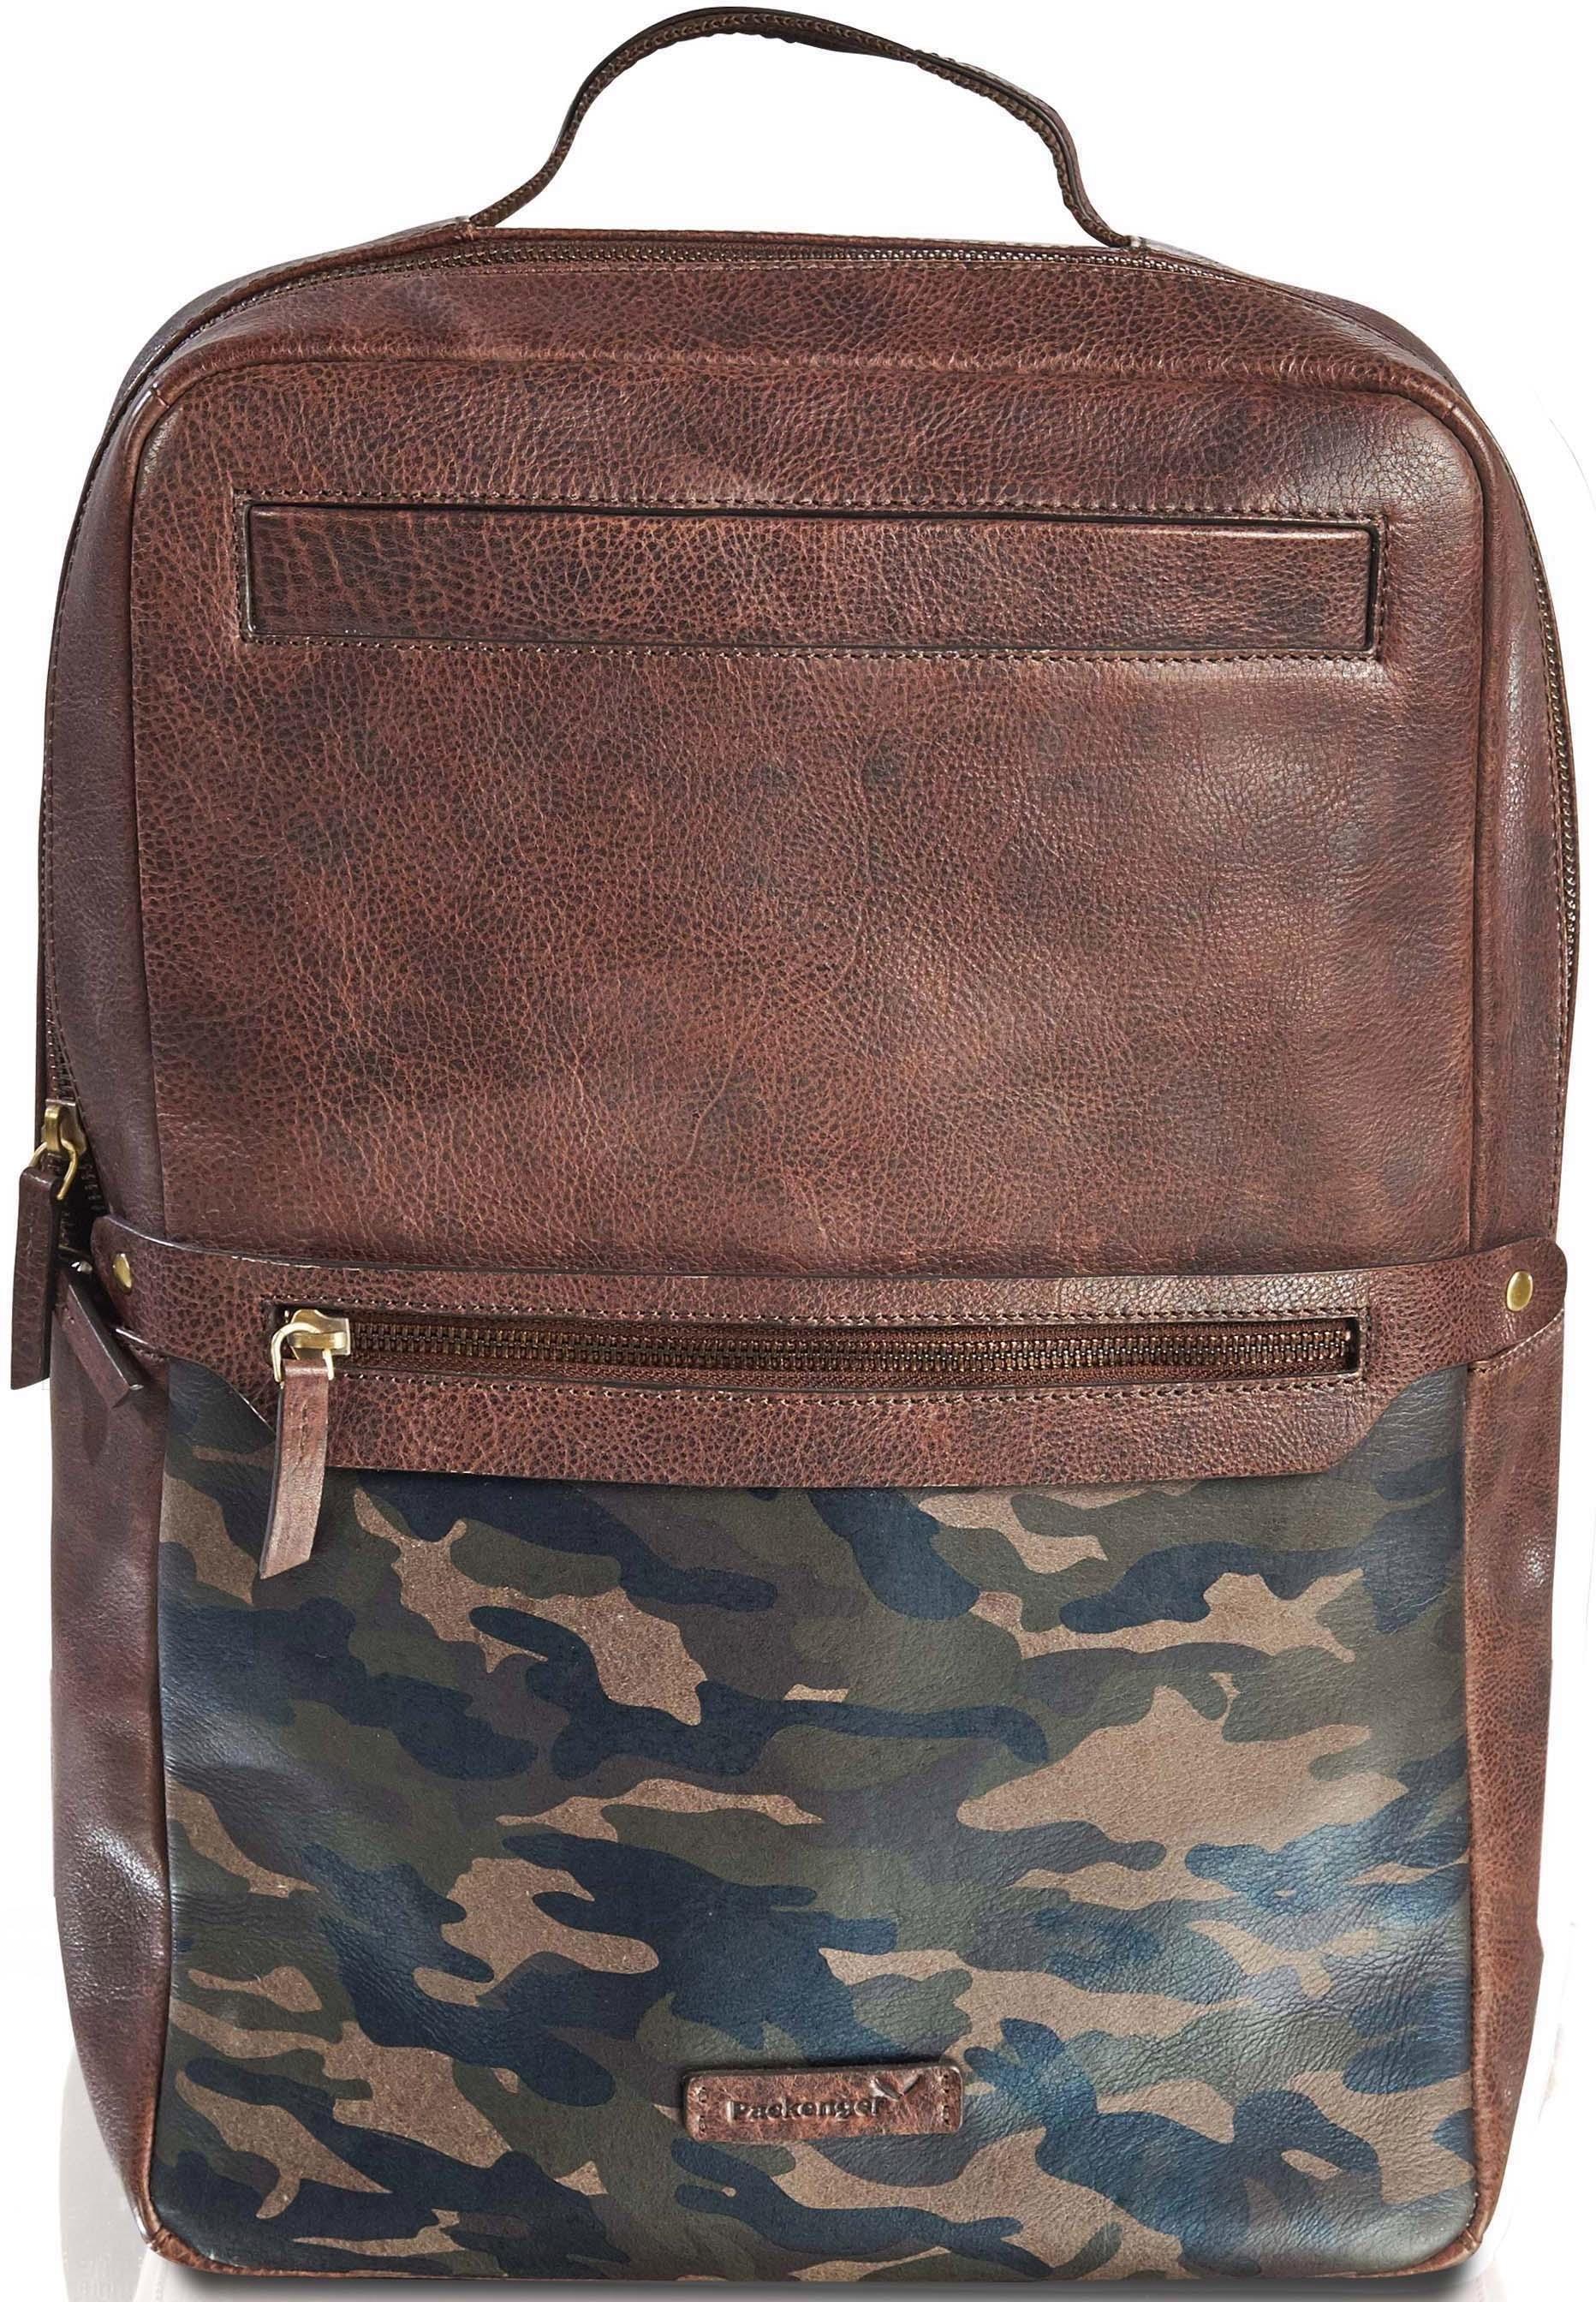 Packenger laptoprugzak »Dallas, Camouflage« - gratis ruilen op otto.nl